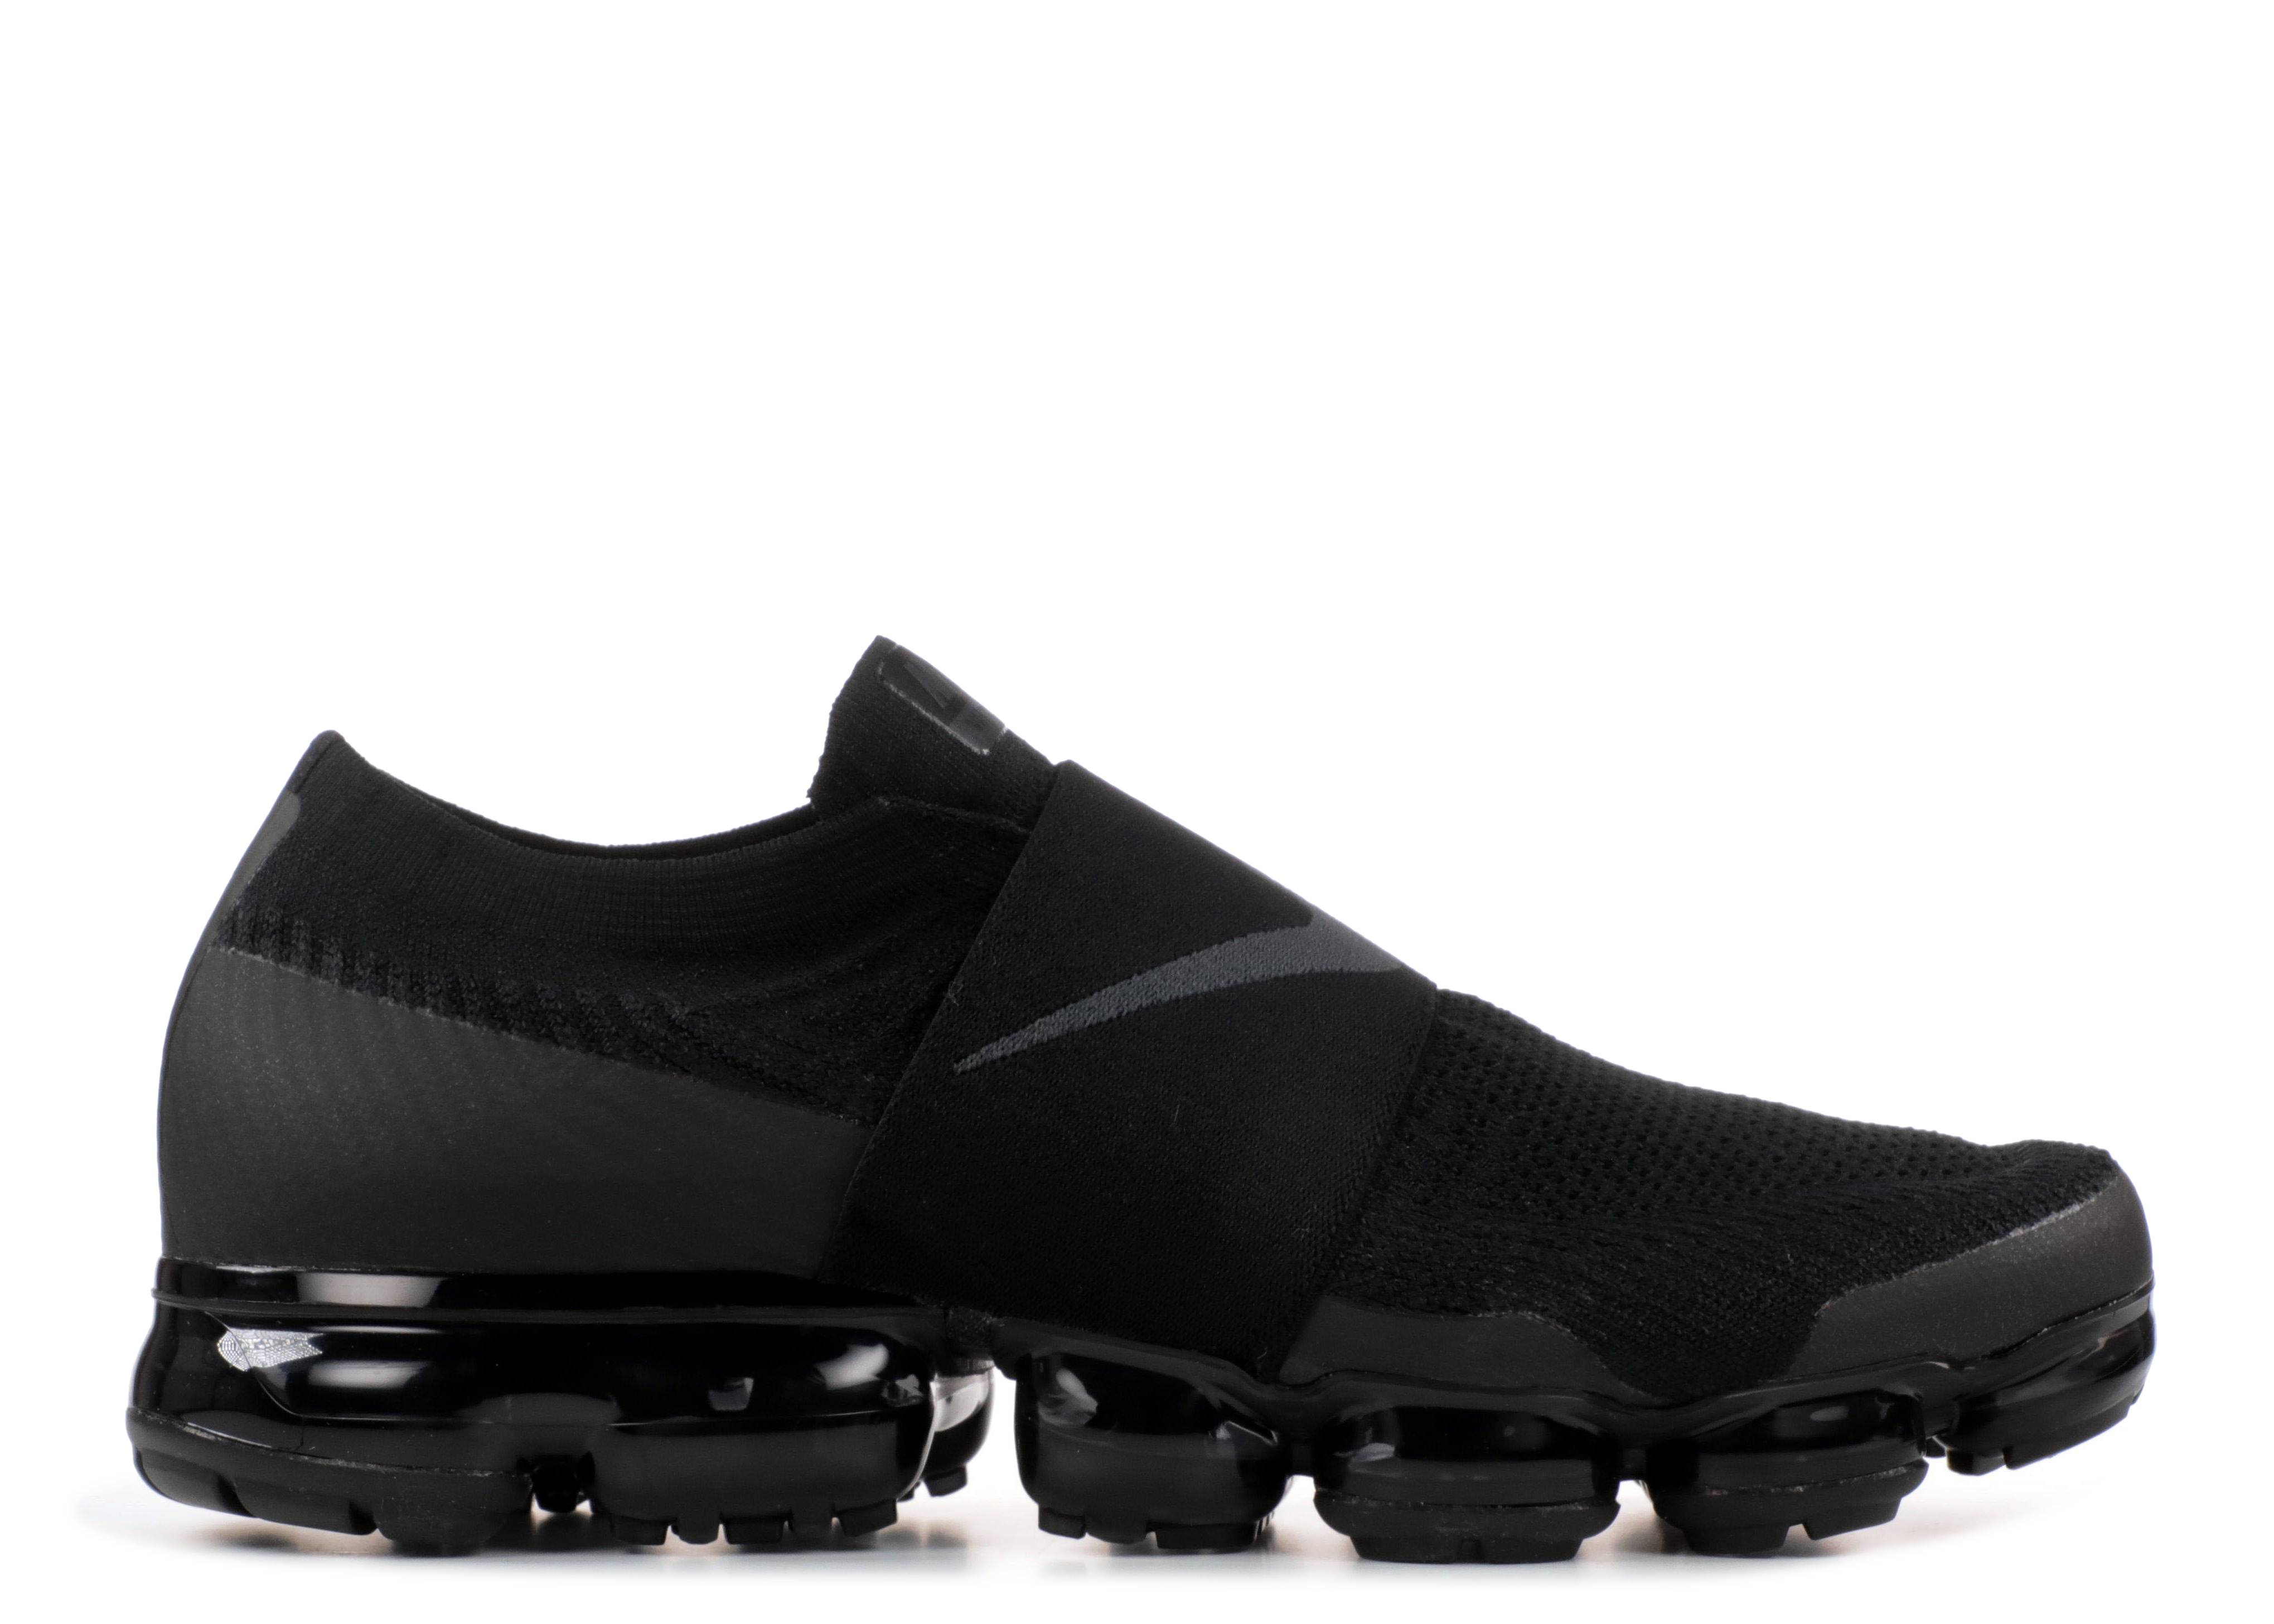 release date: df7d3 d6fcb Wmns Nike Air Vapormax Fk Moc - Nike - aa4155 004 - black/anthracite |  Flight Club